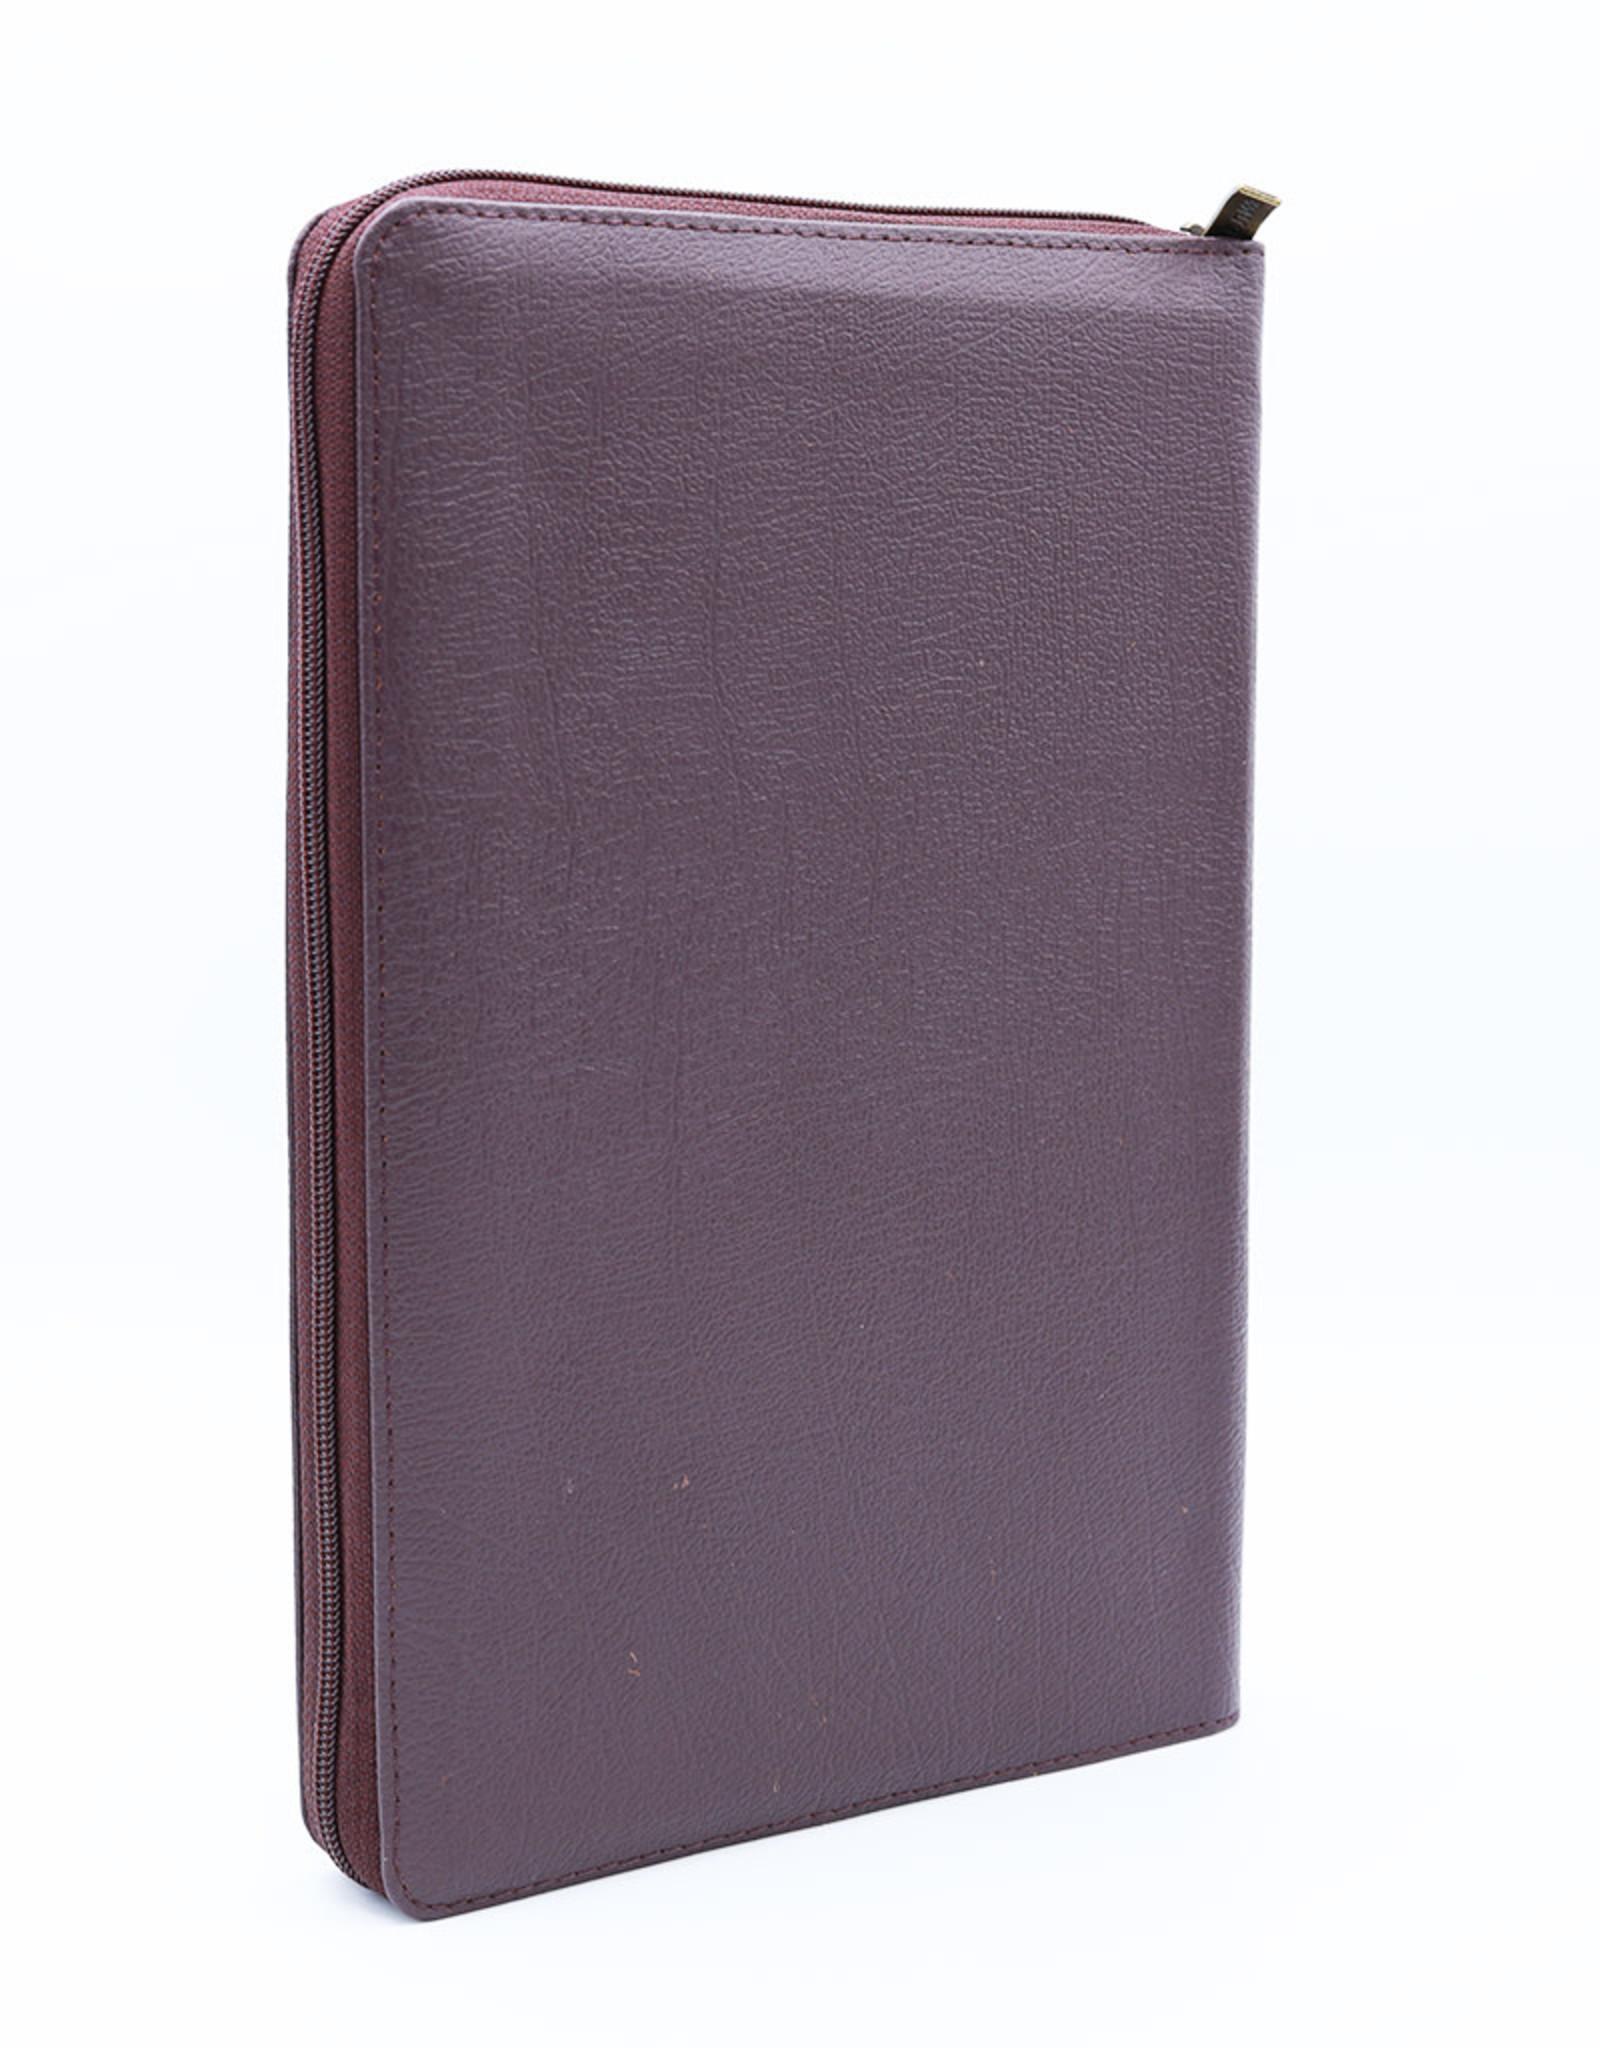 Библия, Каноническая (SYNO), Leather with Zipper, Large Burgundy